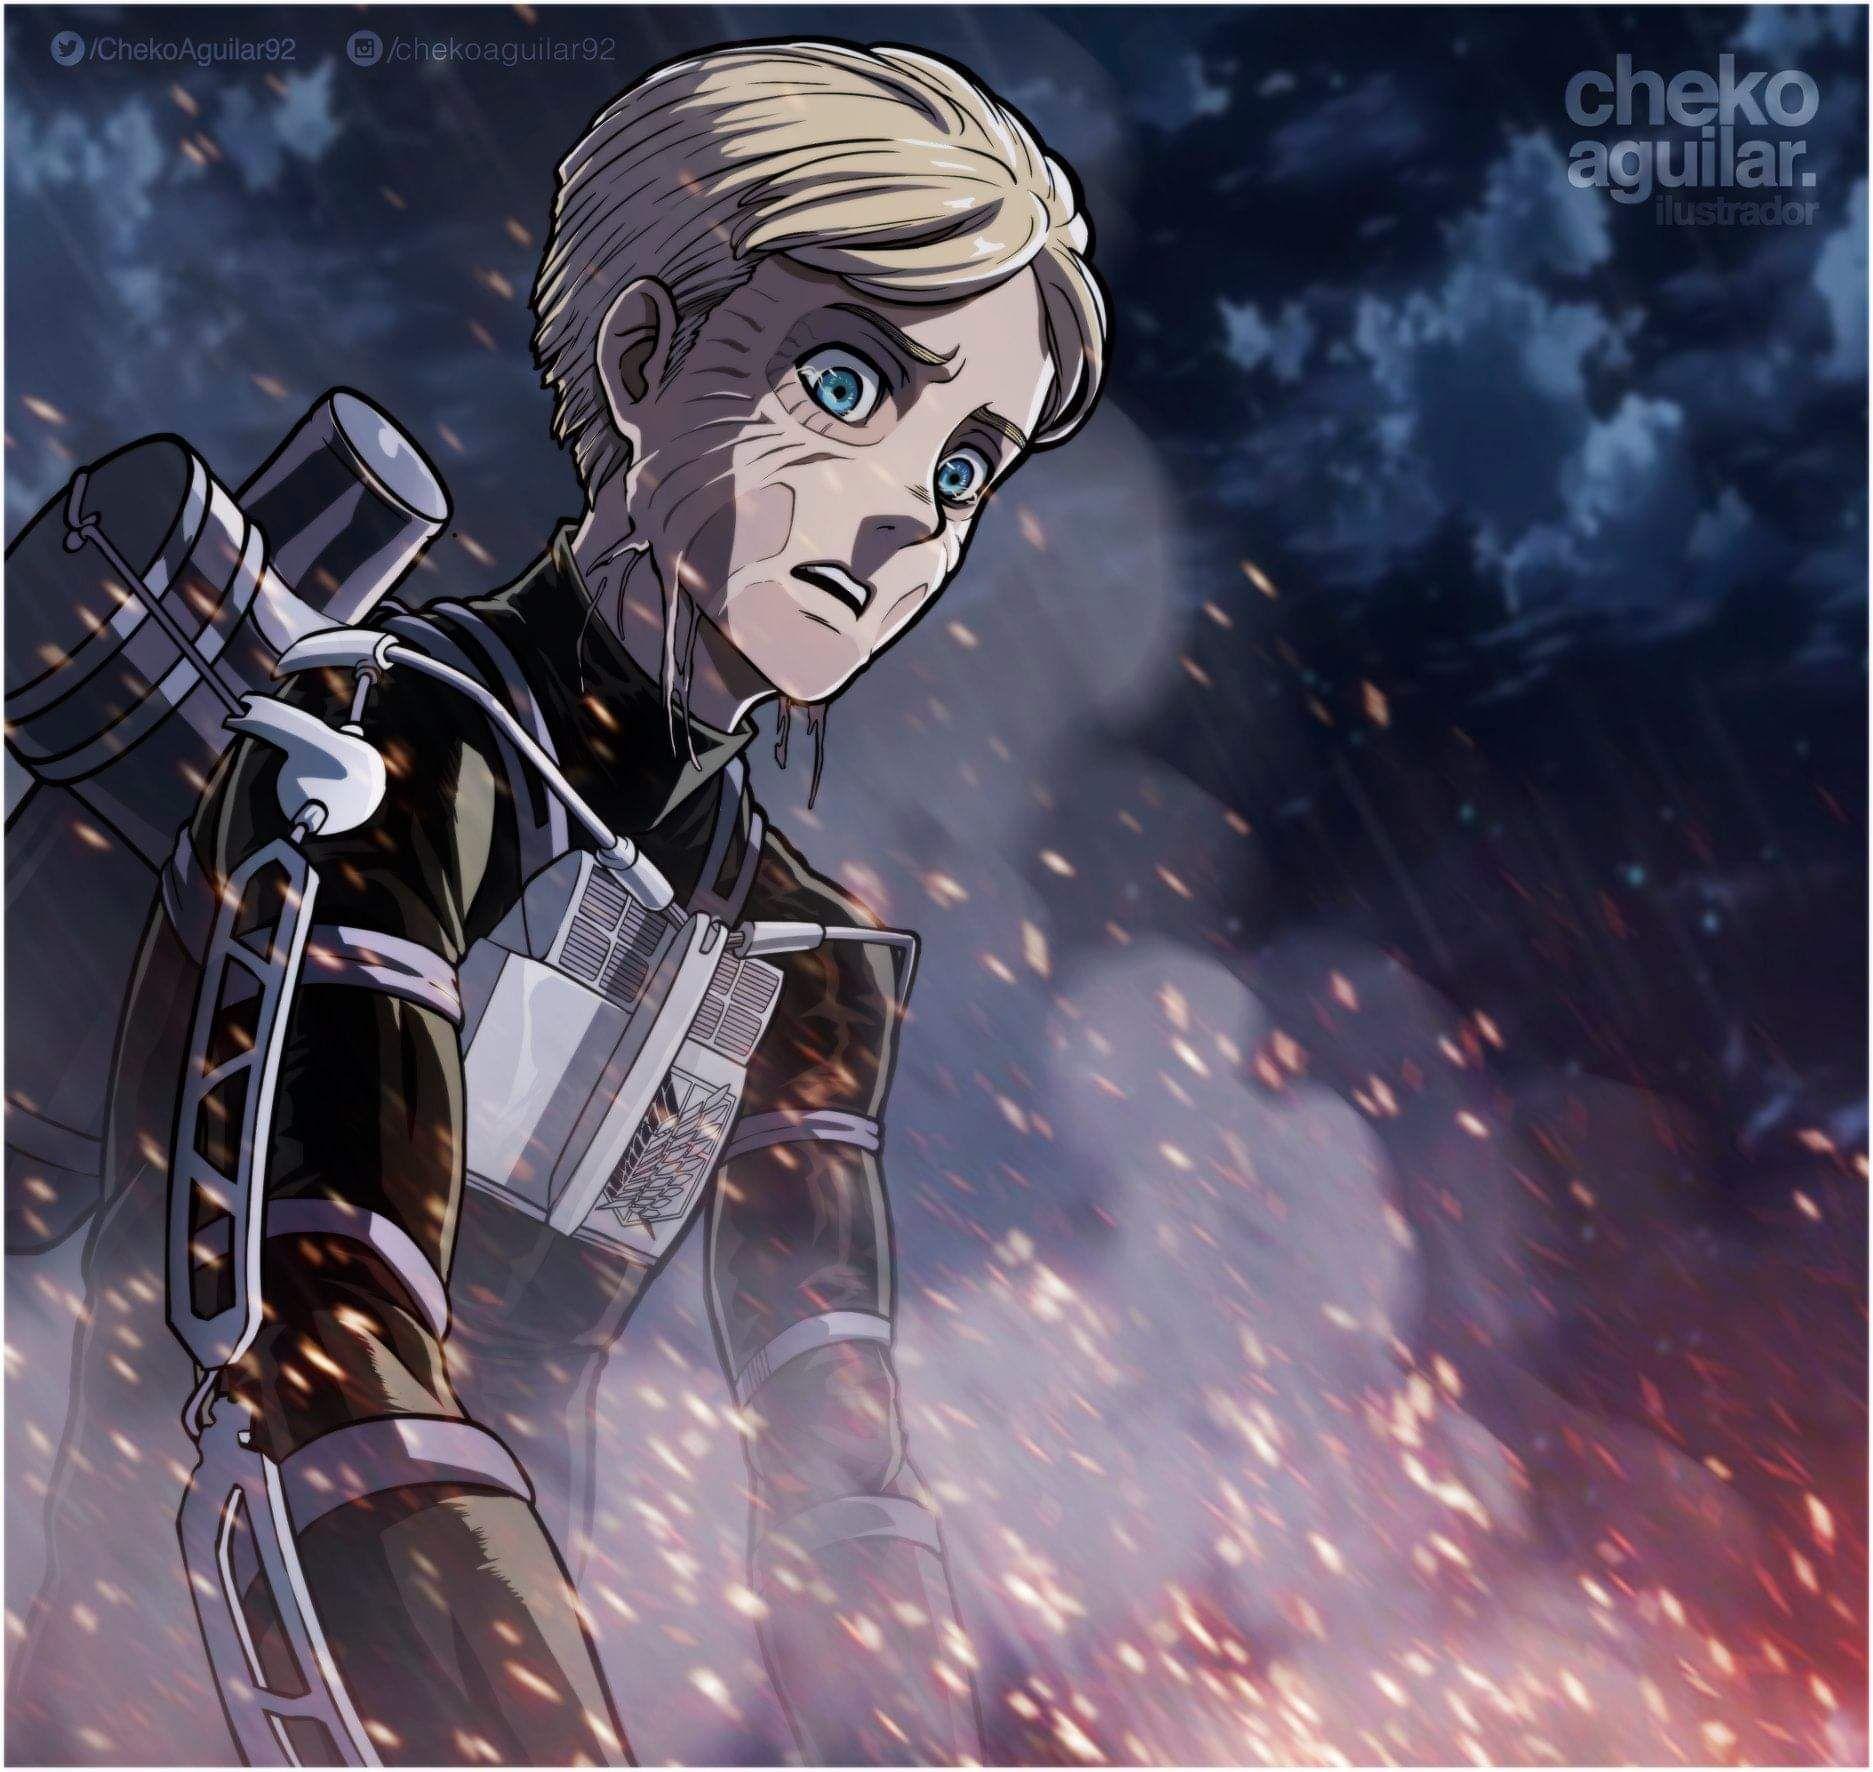 Pin By Charliecarls1 On Attack On Titan Shingeki No Kyojin Armin Attack On Titan Anime